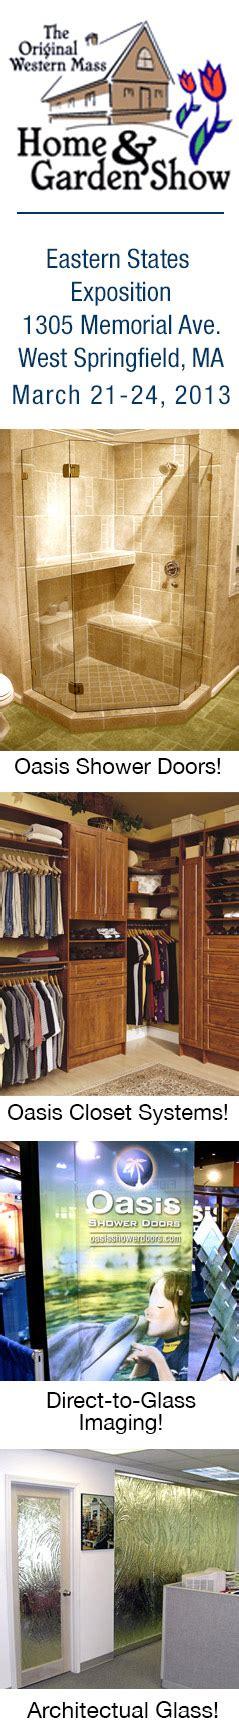 2013 western ma home garden show oasis shower doors